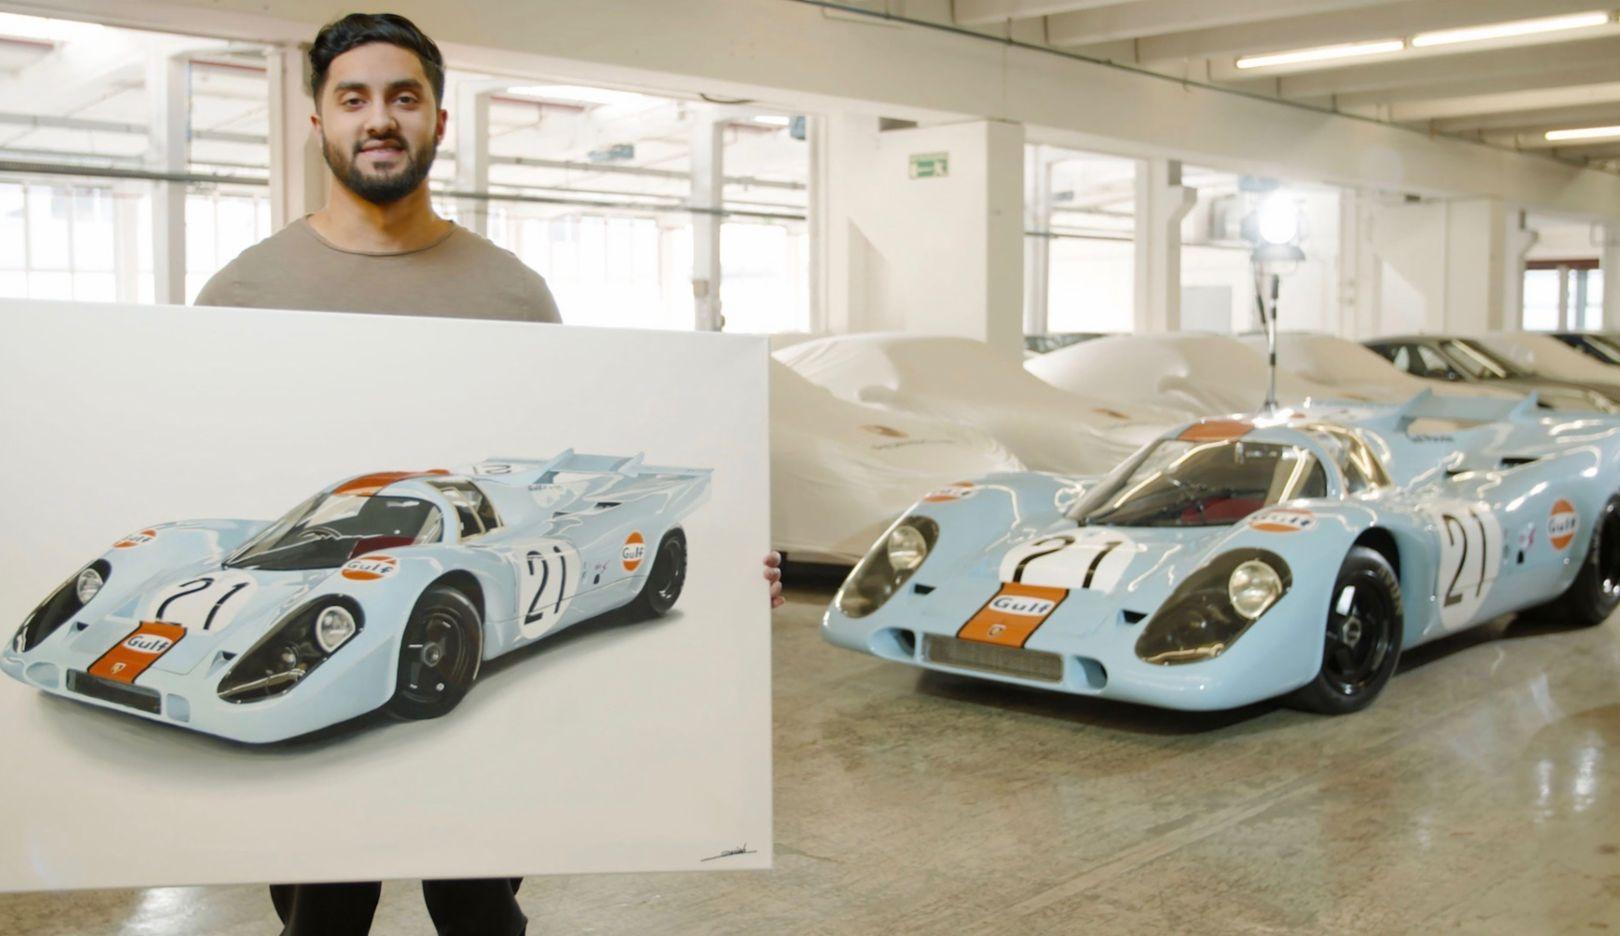 Roman Miah, 917 KH Gulf, 2018, Porsche AG